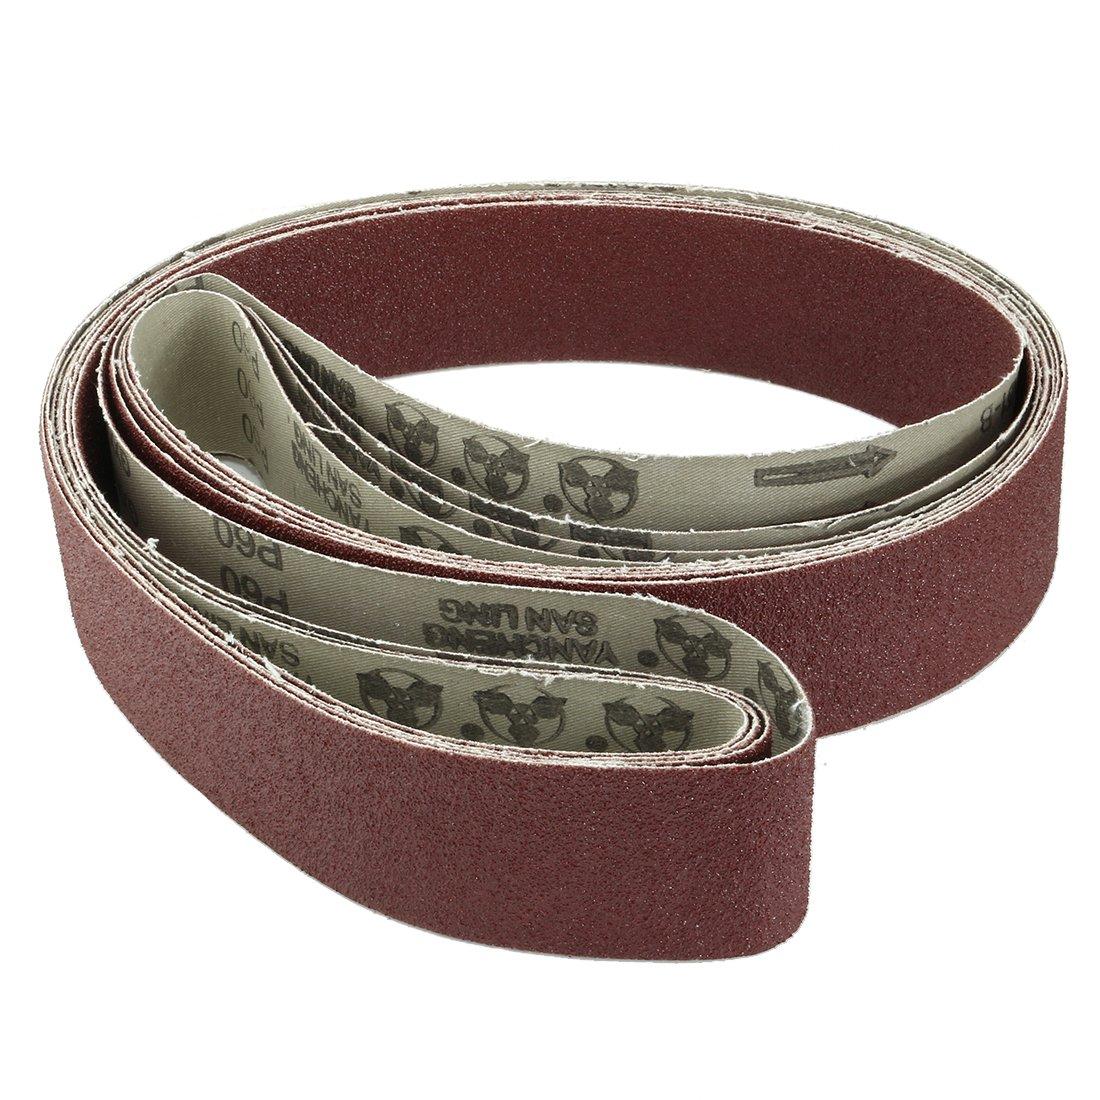 uxcell 2-Inch x 72-Inch 60 Grit Lapped Joint Aluminum Oxide Sanding Belt 4pcs